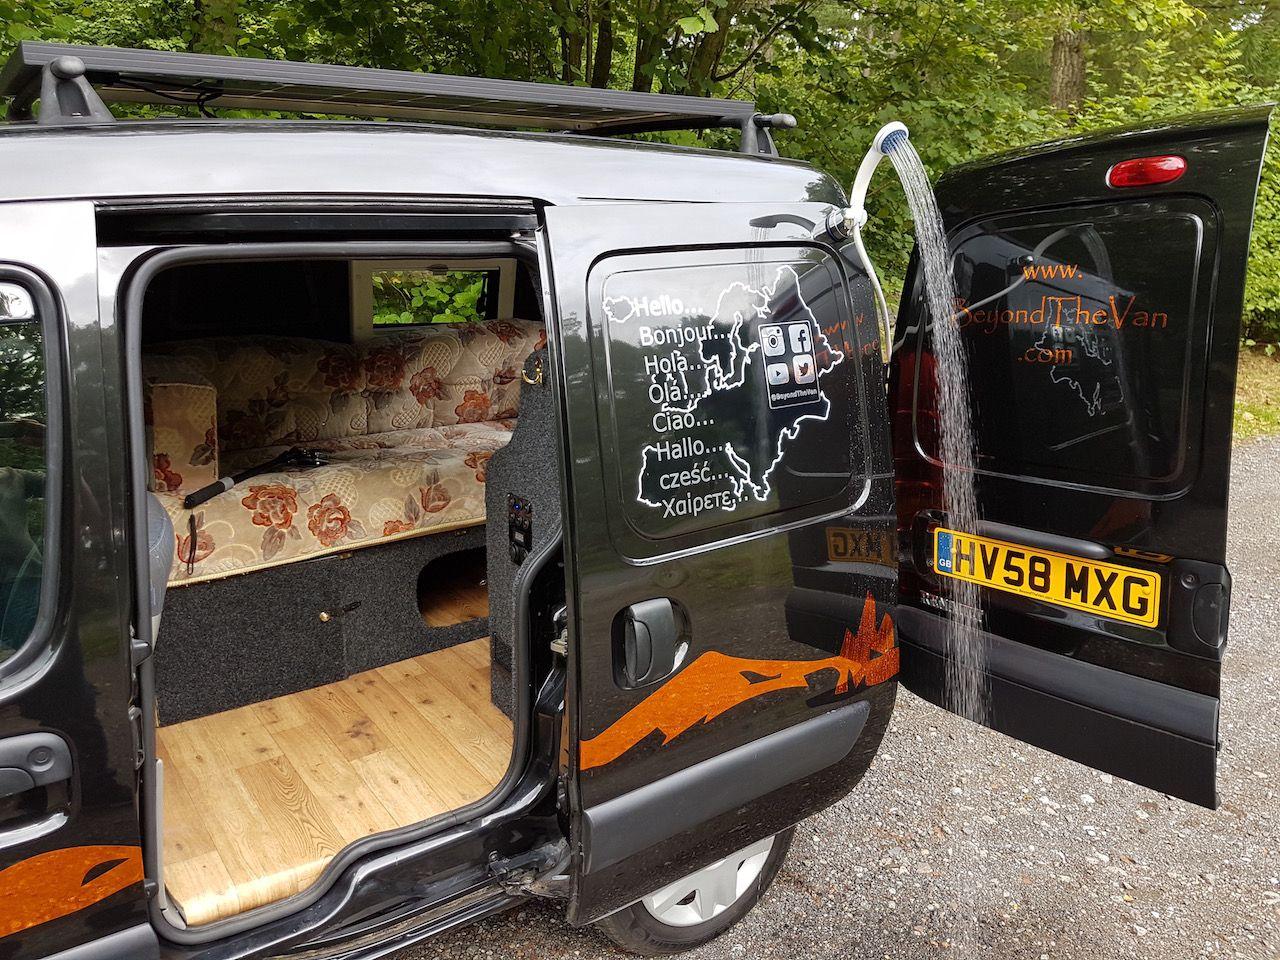 renault kangoo micro camper travel van self converted as. Black Bedroom Furniture Sets. Home Design Ideas